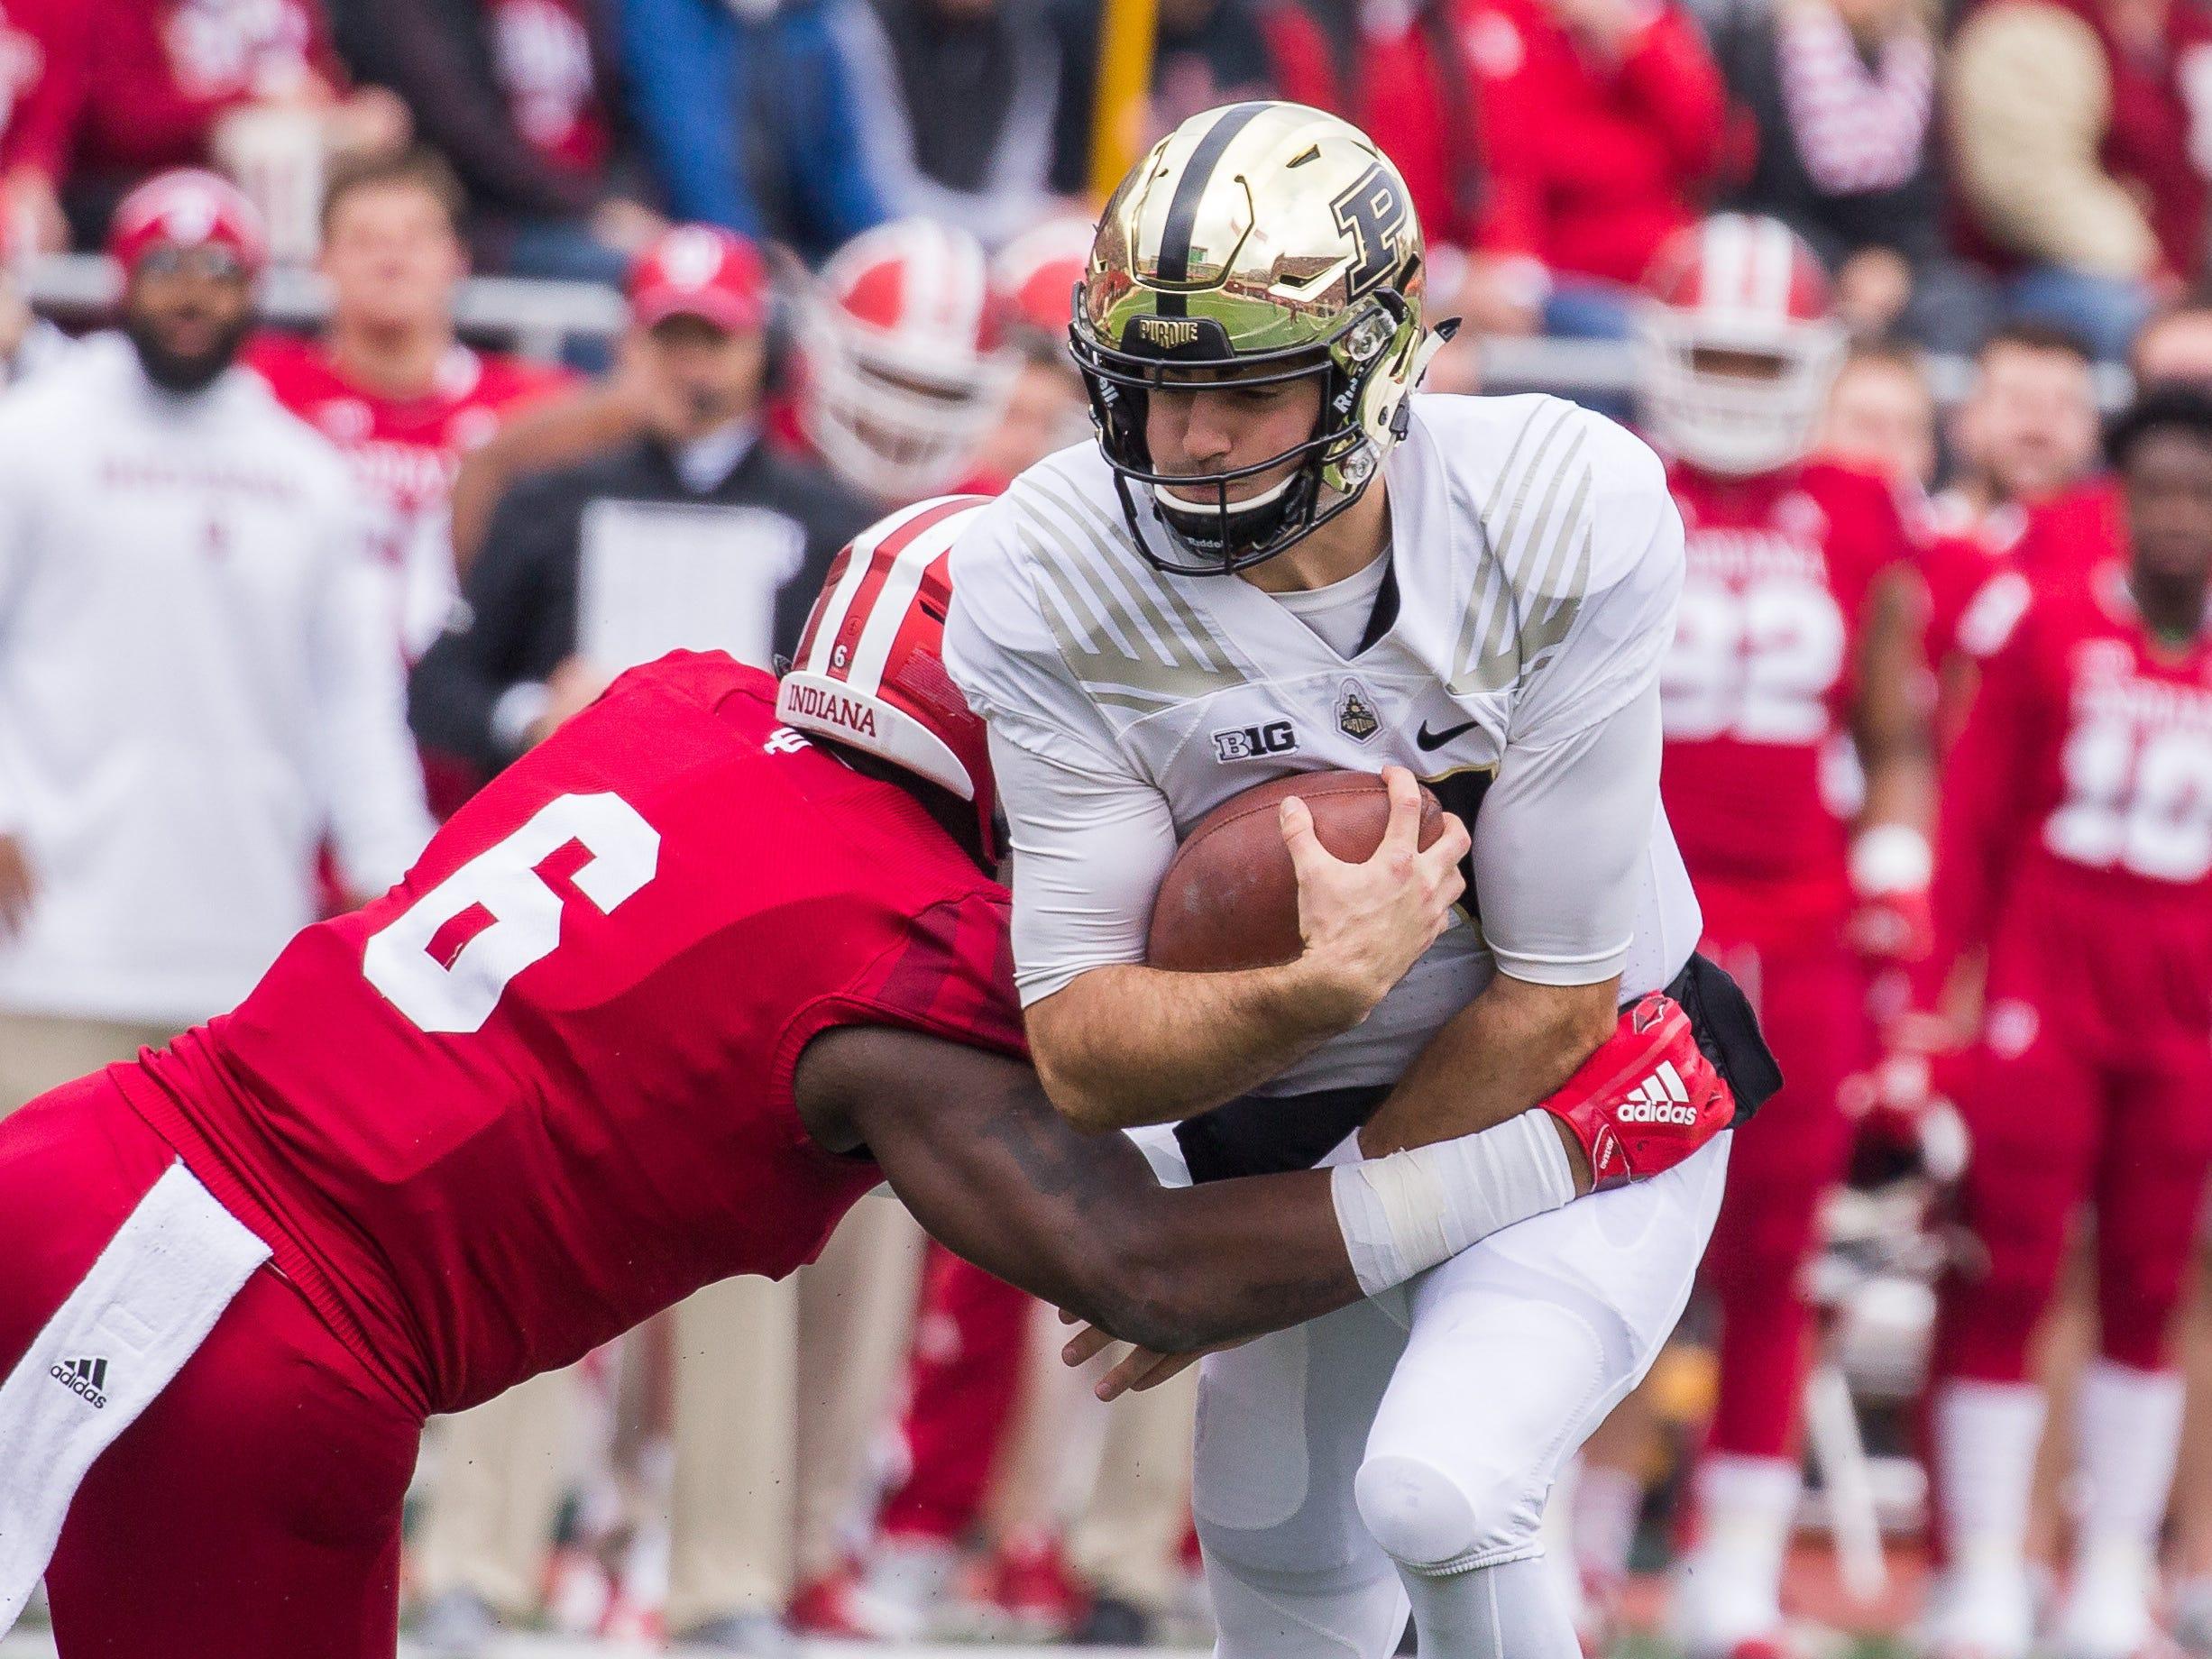 Purdue Boilermakers quarterback David Blough (11) is tackled by Indiana Hoosiers defensive lineman James Head Jr. (6) in the first quarter at Memorial Stadium.